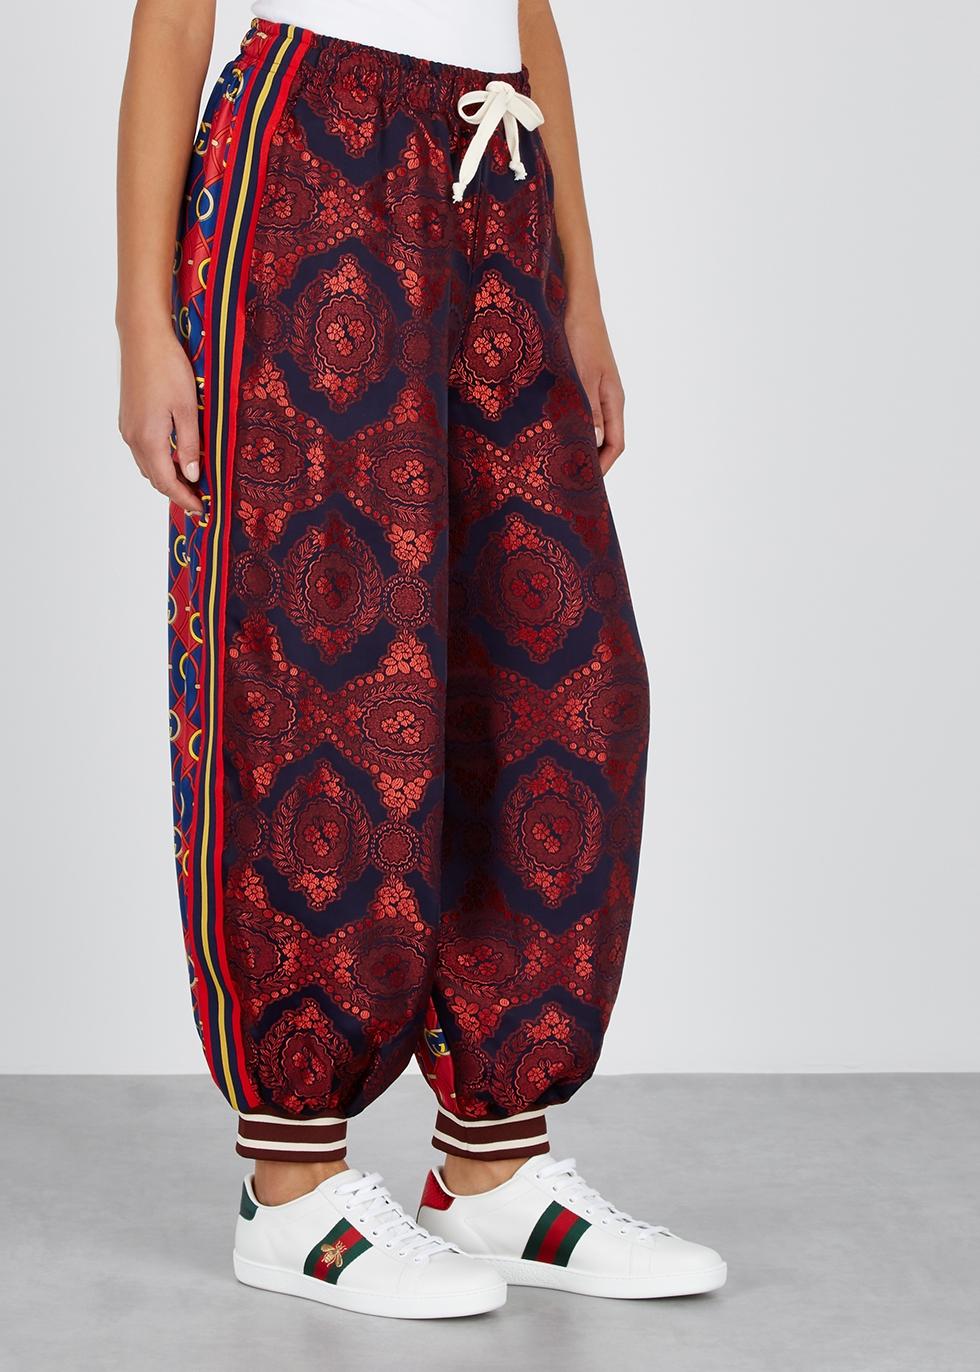 Printed silk and jacquard sweatpants - Gucci